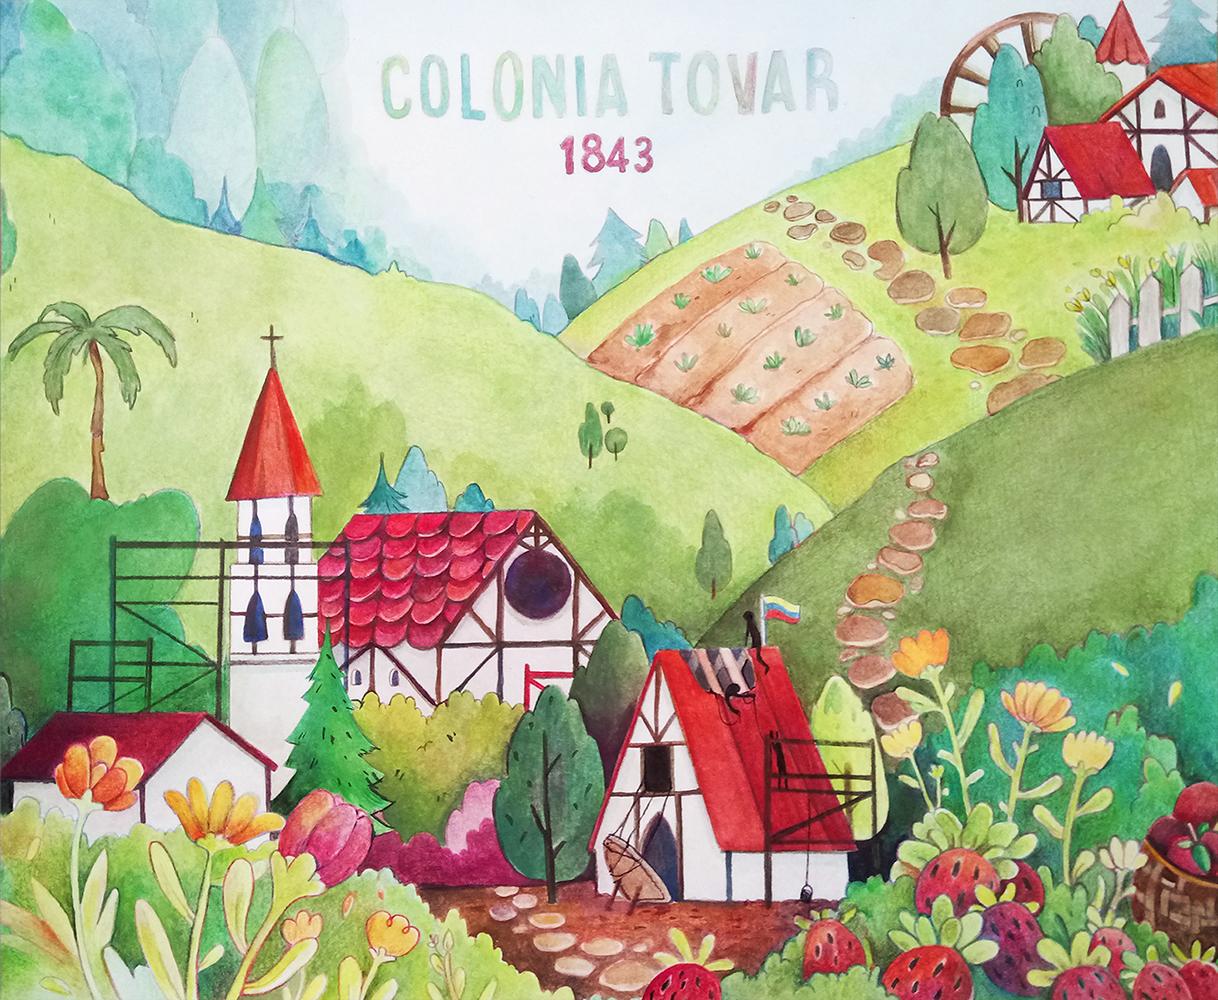 A-04 Colonia Tovar 1843